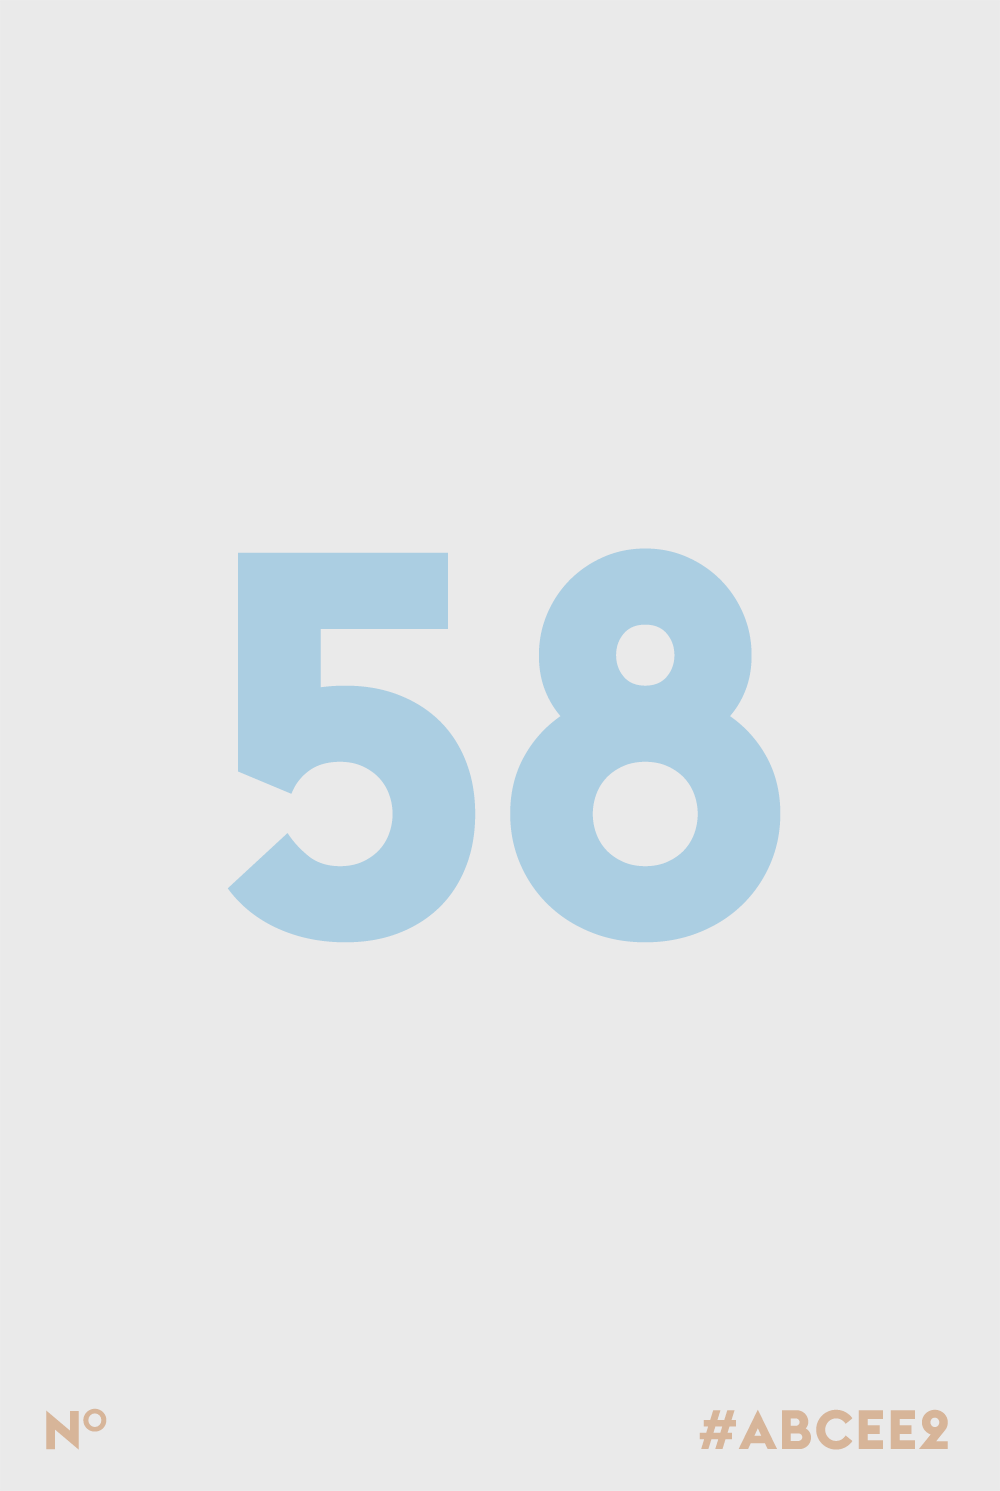 cc_0057_58